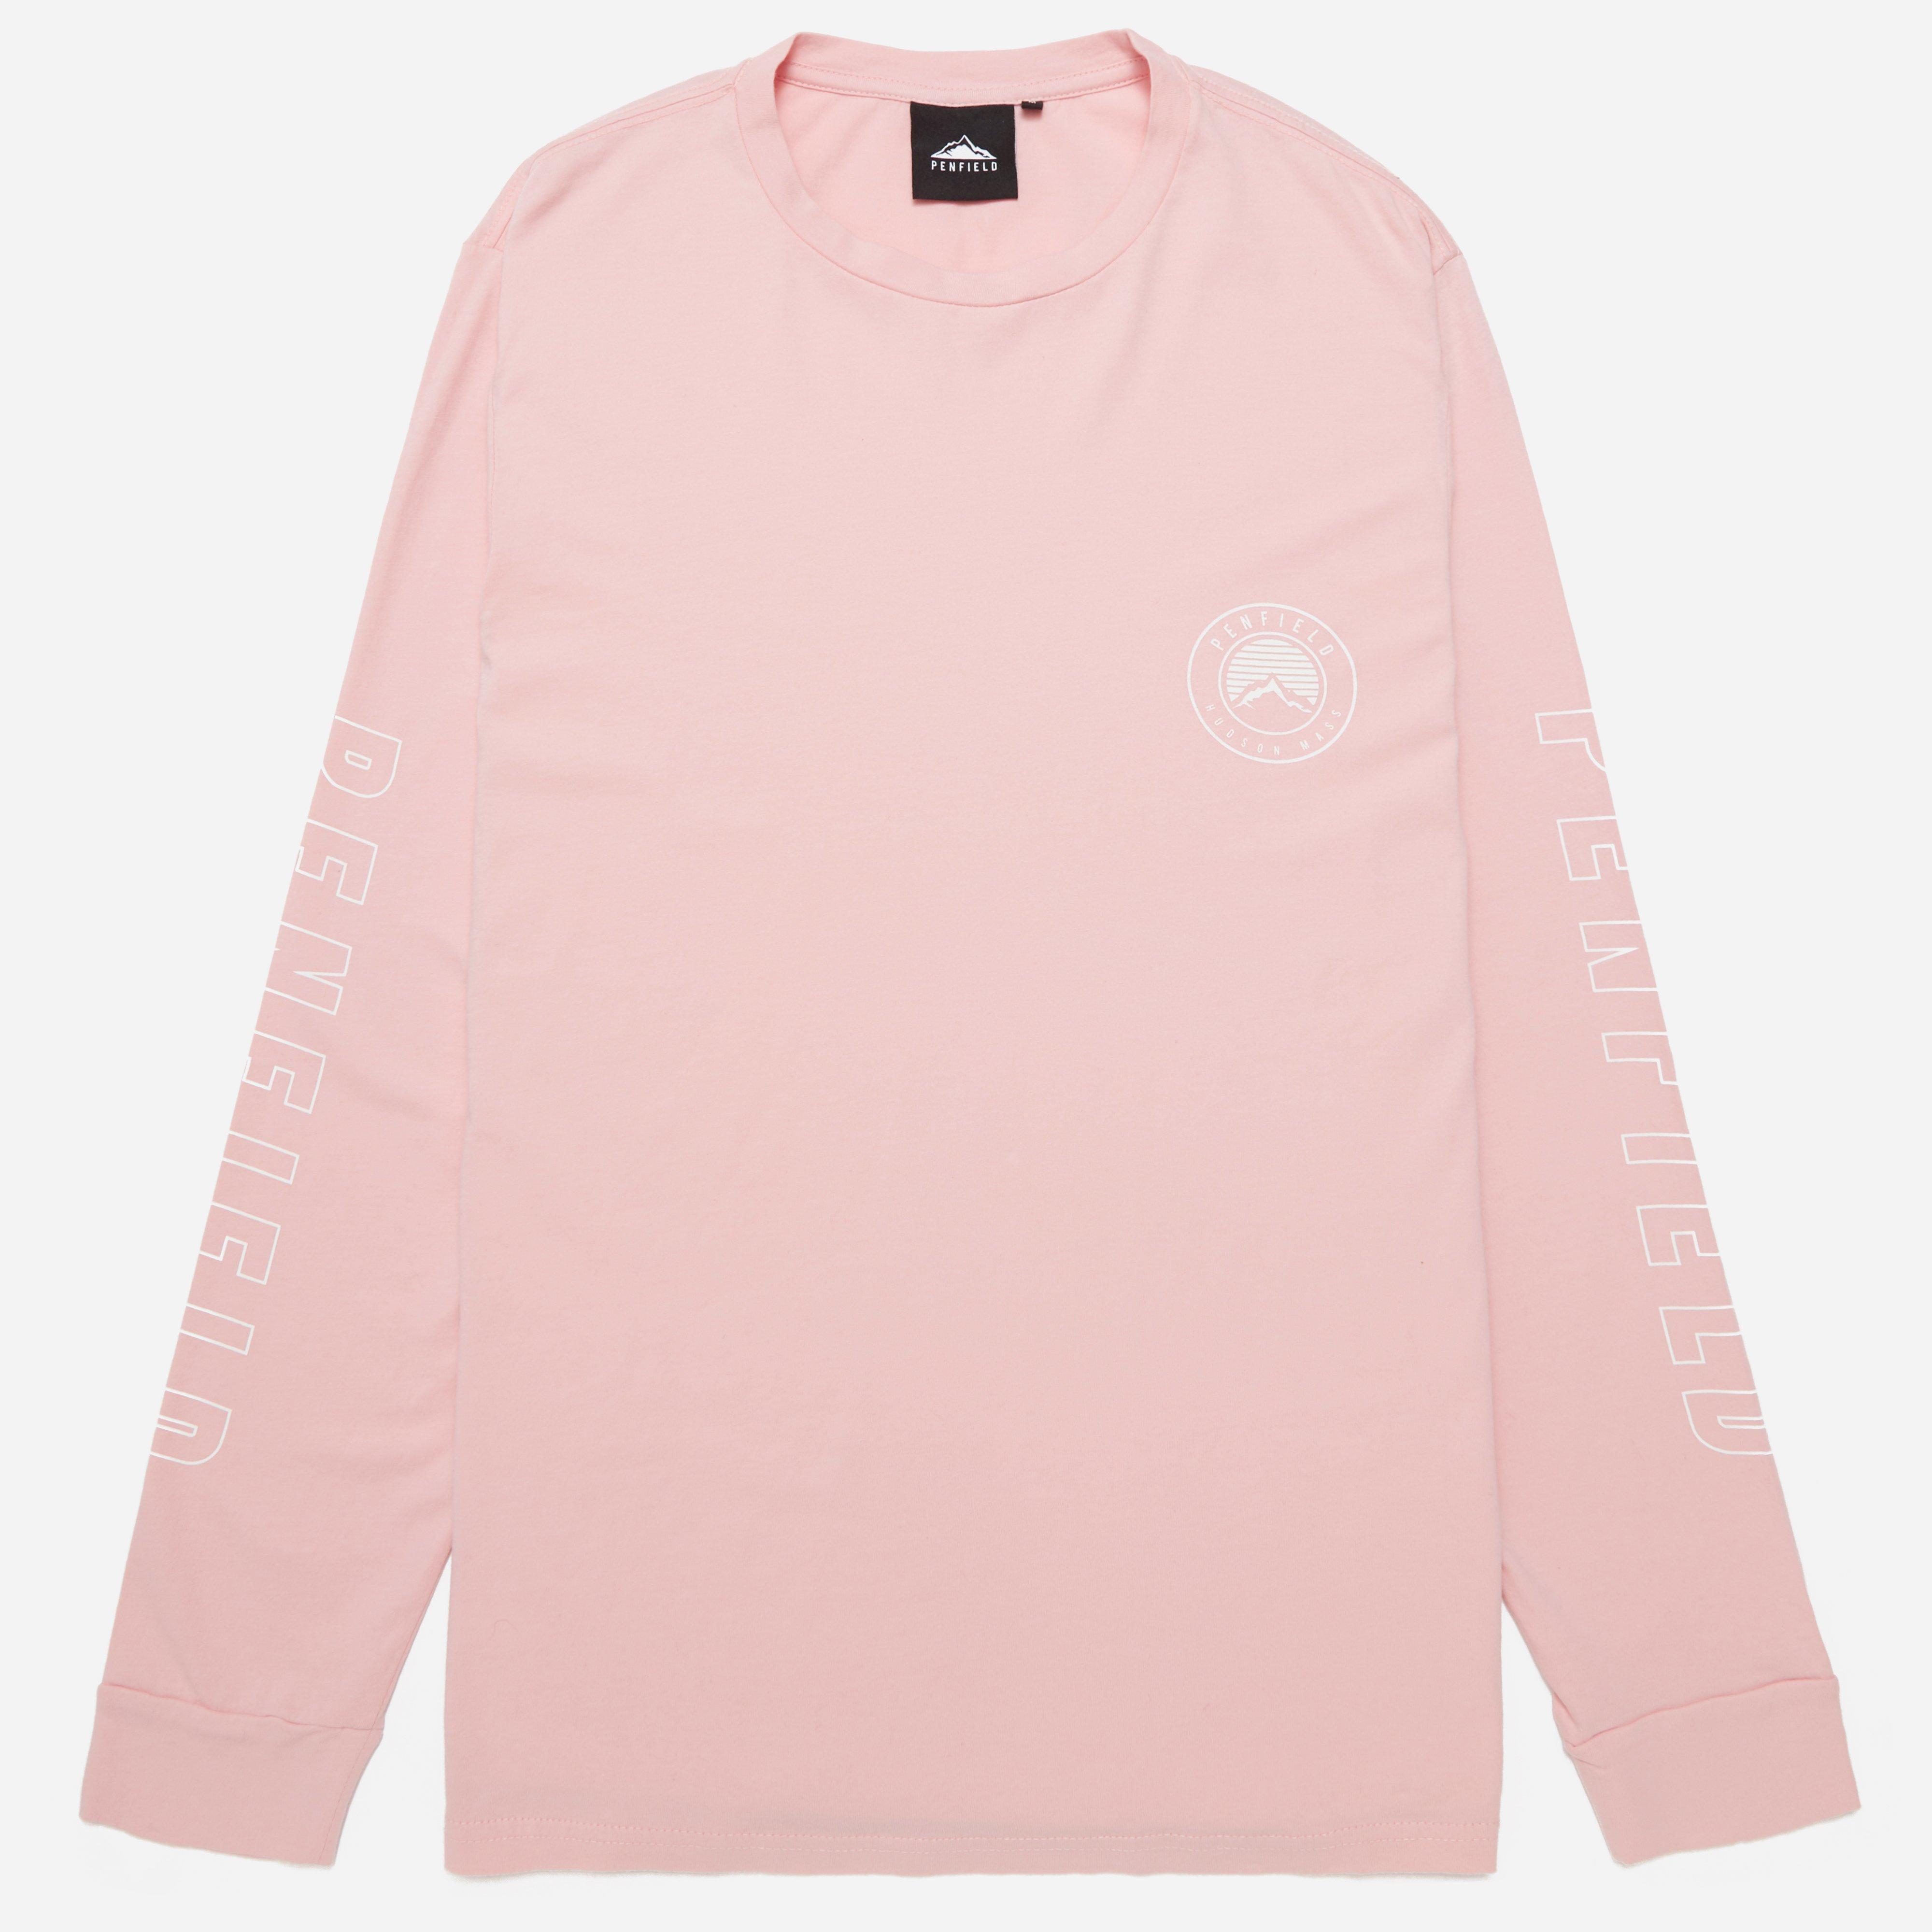 Penfield Aloka T-shirt